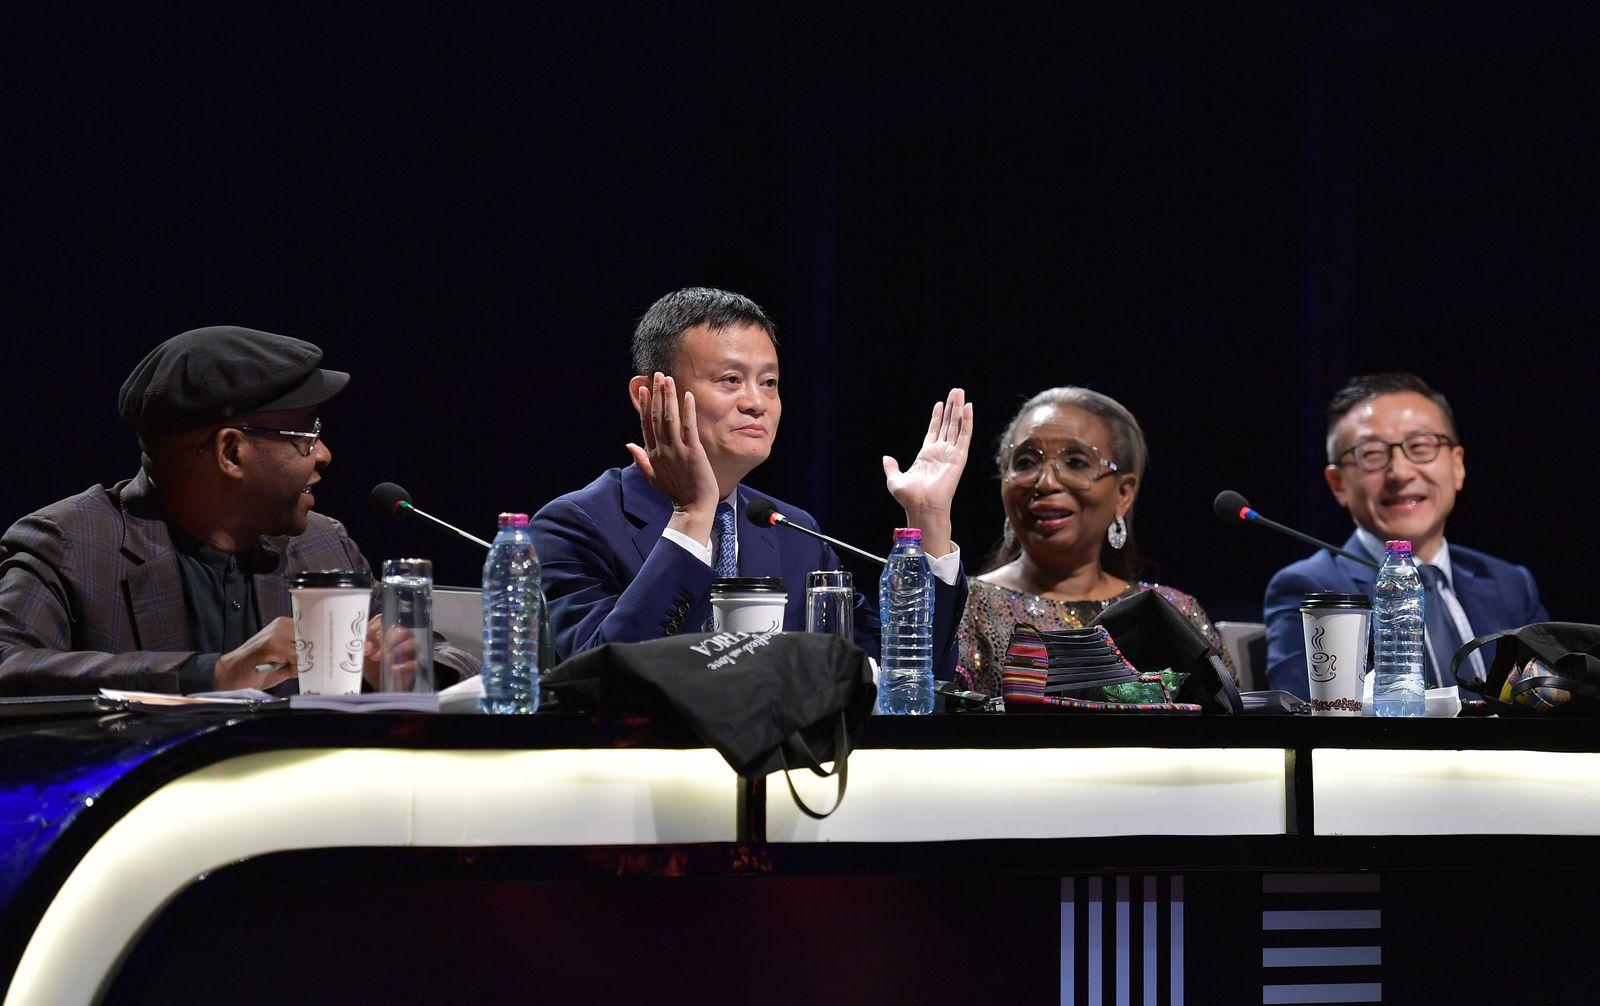 ACCRA, GHANA - NOVEMBER 16: Alibaba founder Jack Ma (2nd L) and Joe Tsai (R), co-founder and executive vice chairman of